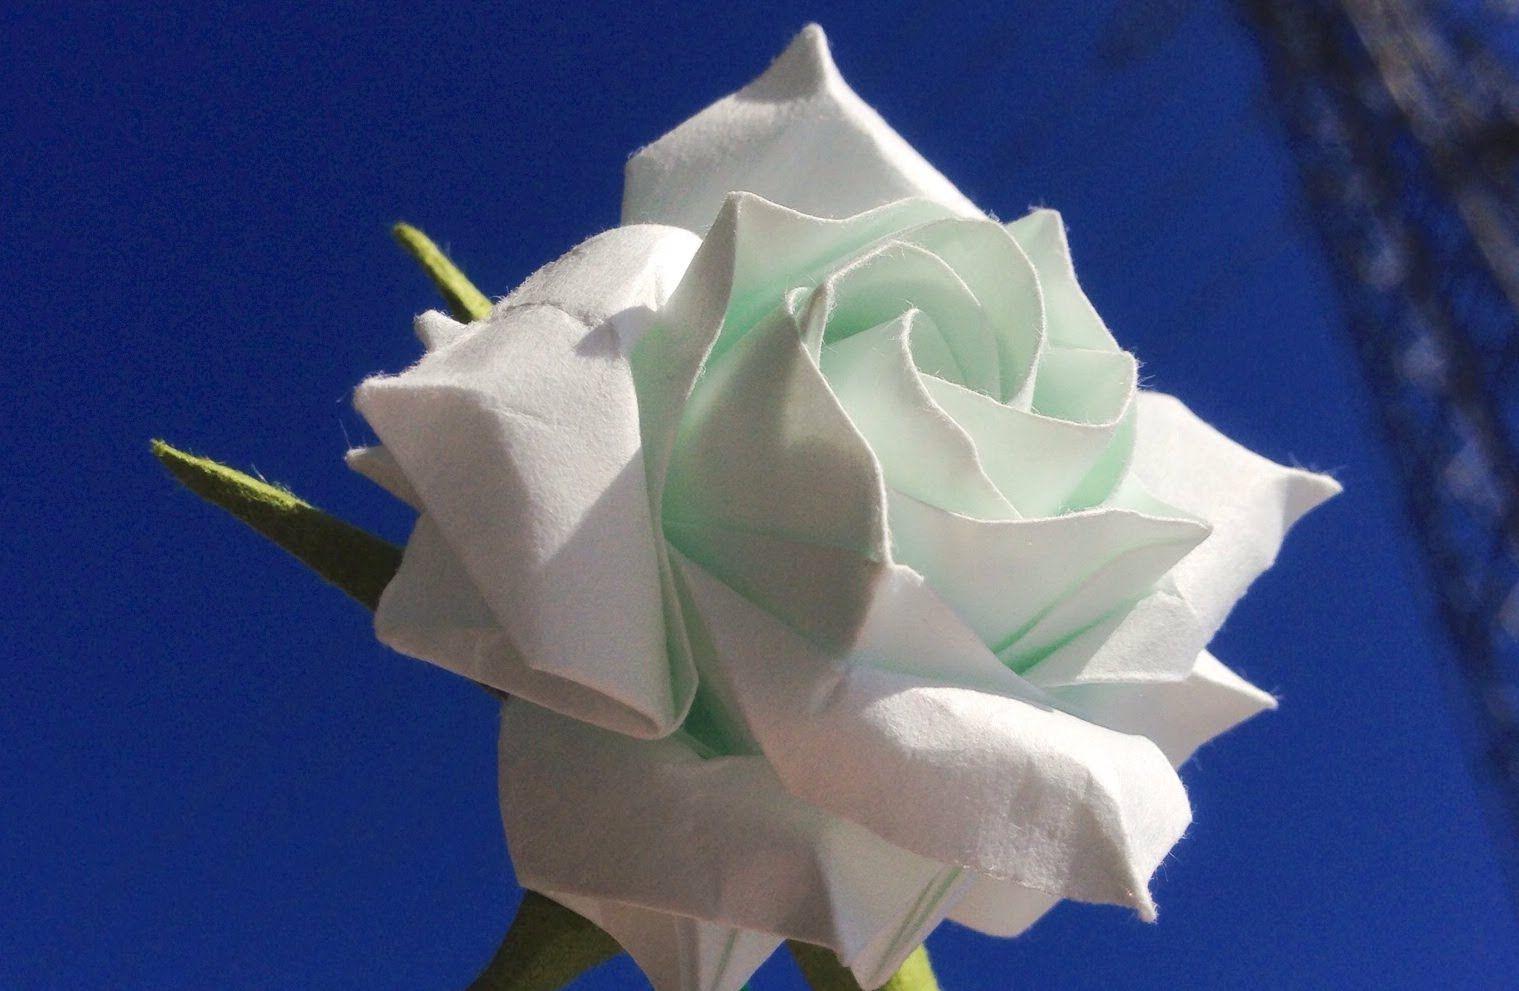 Gp Hoa Hng Trng 18 Cnh Origami Diy Pinterest Origami